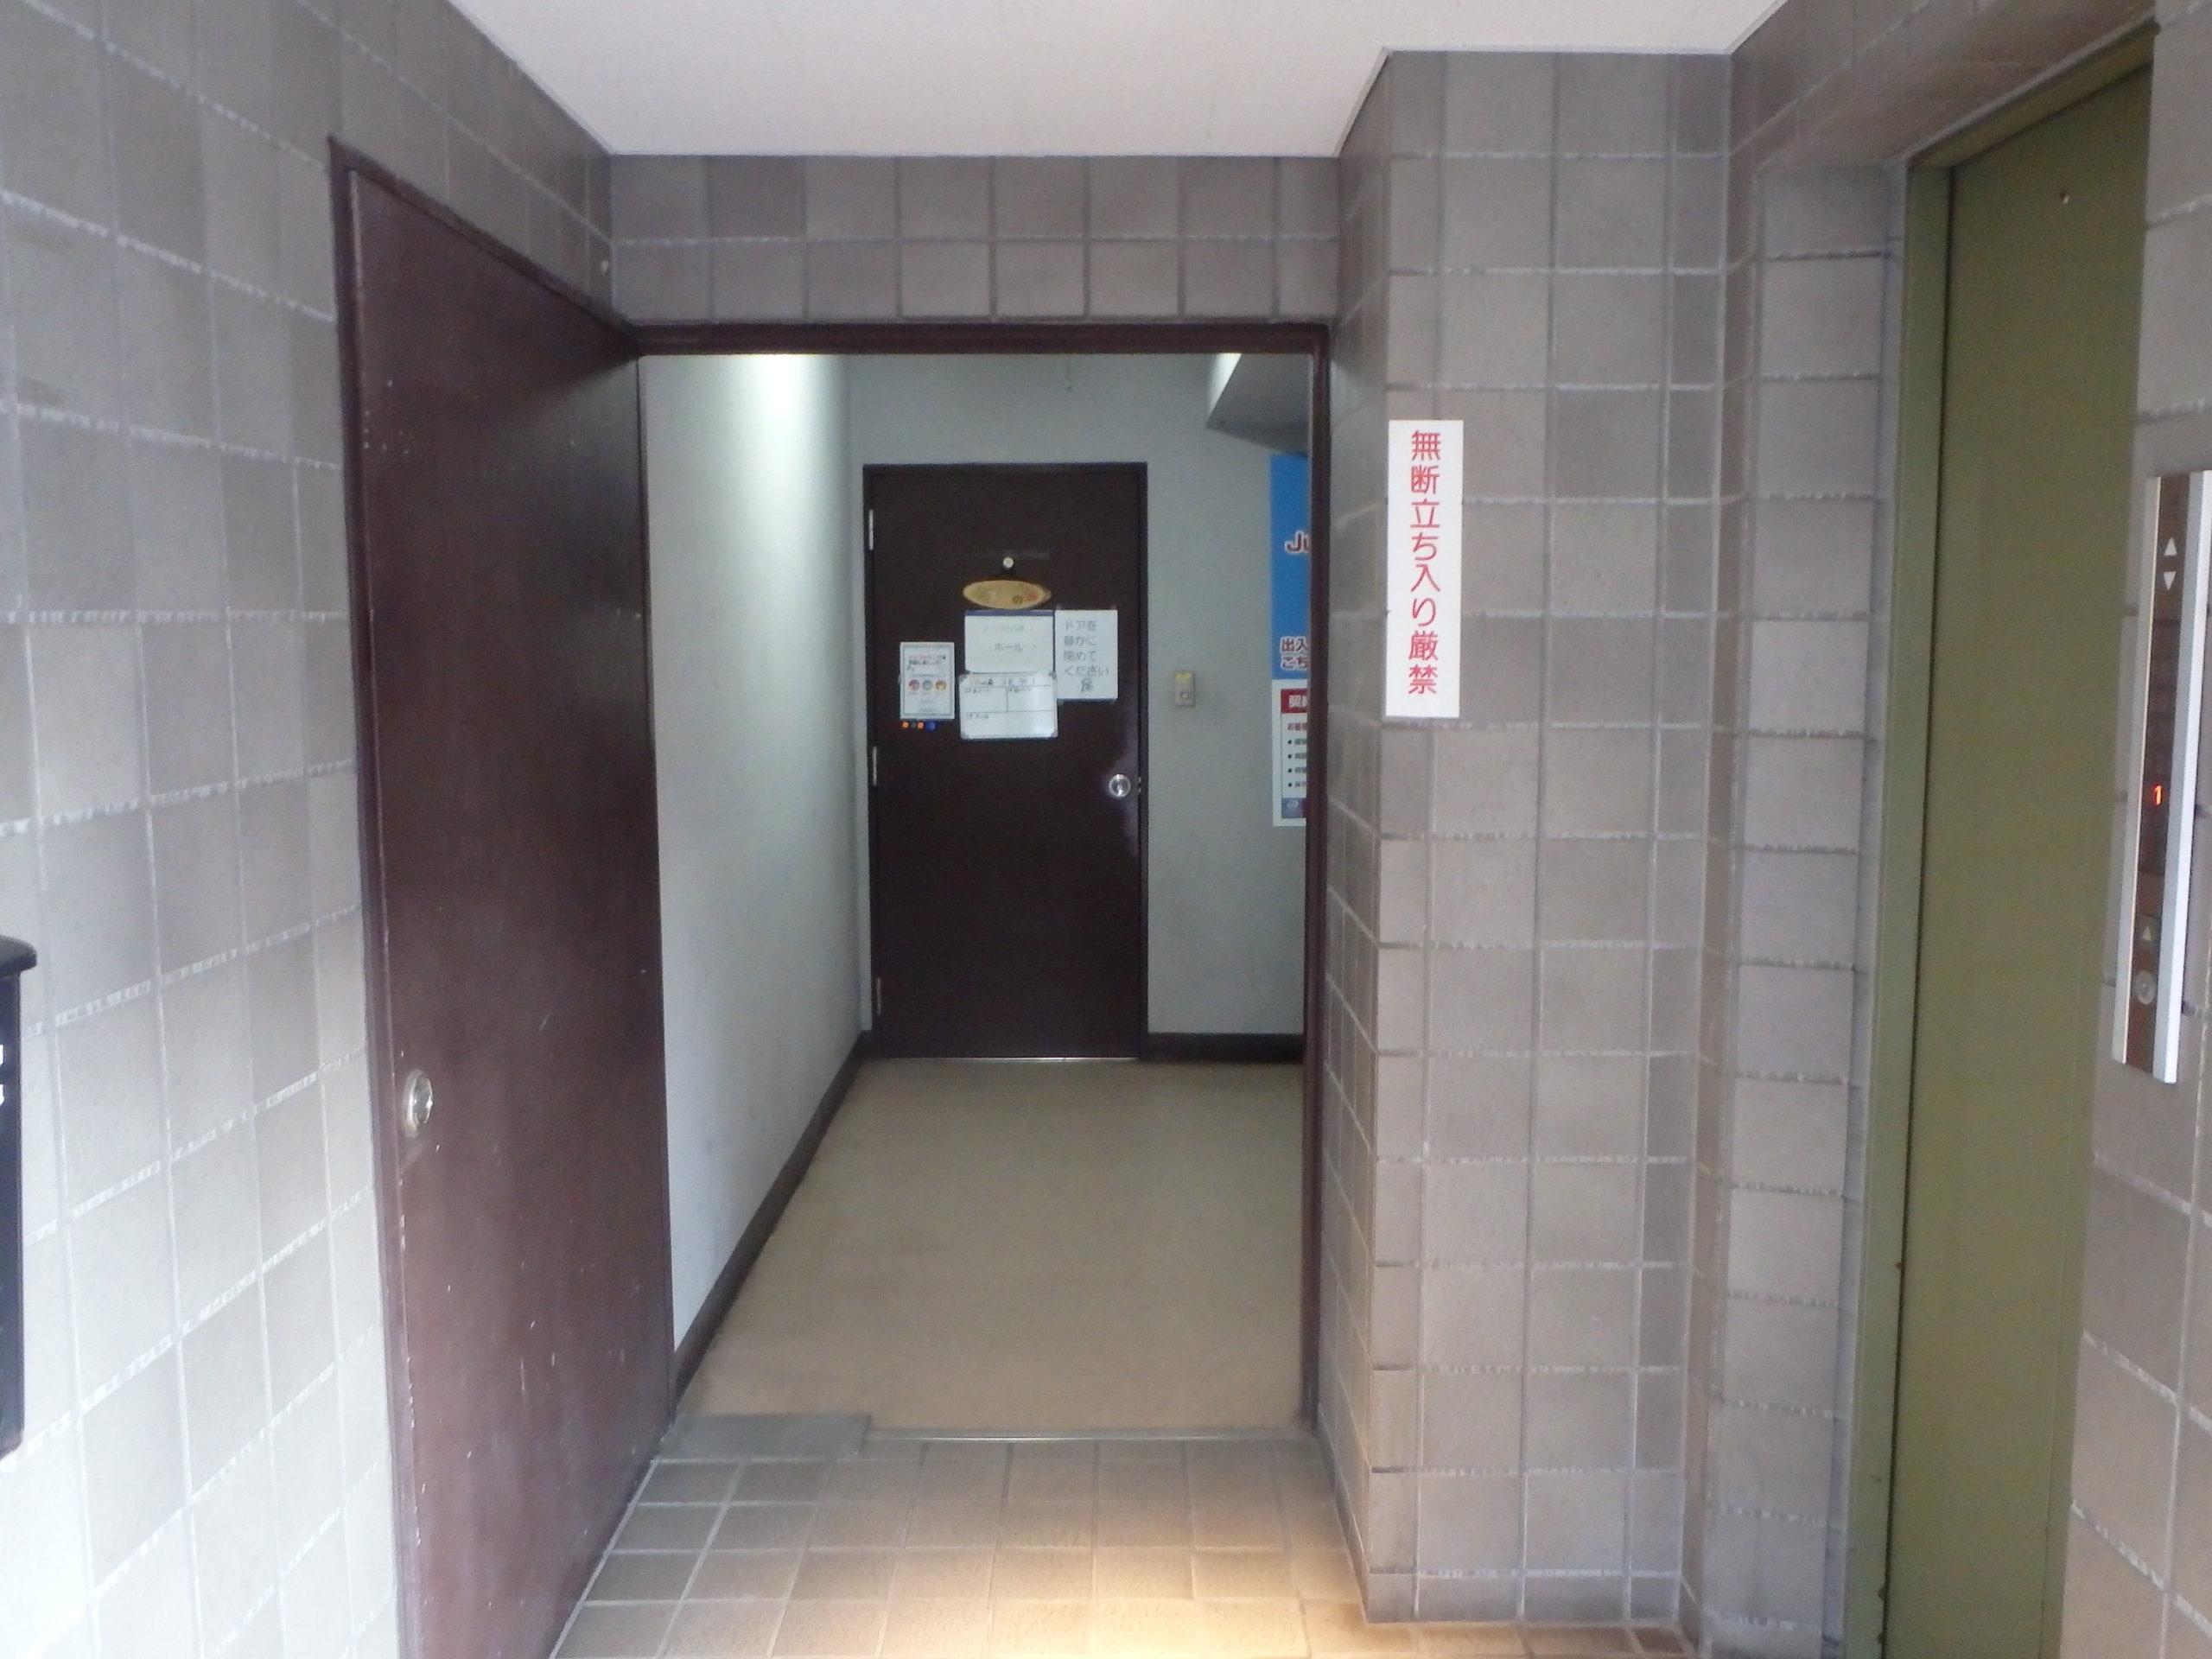 1Fの廊下を奥へ進みます